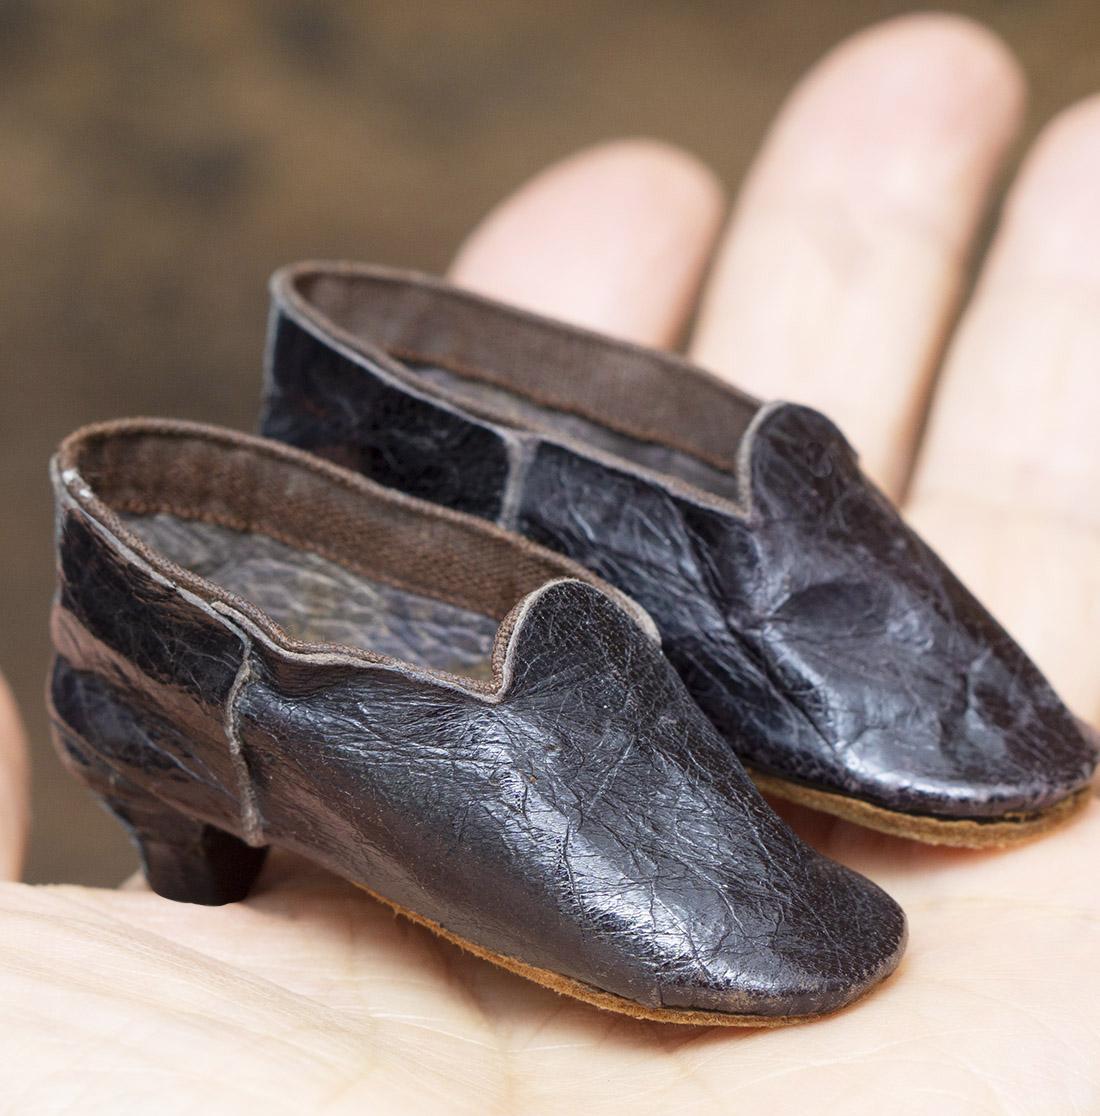 Antique fashion doll shoes